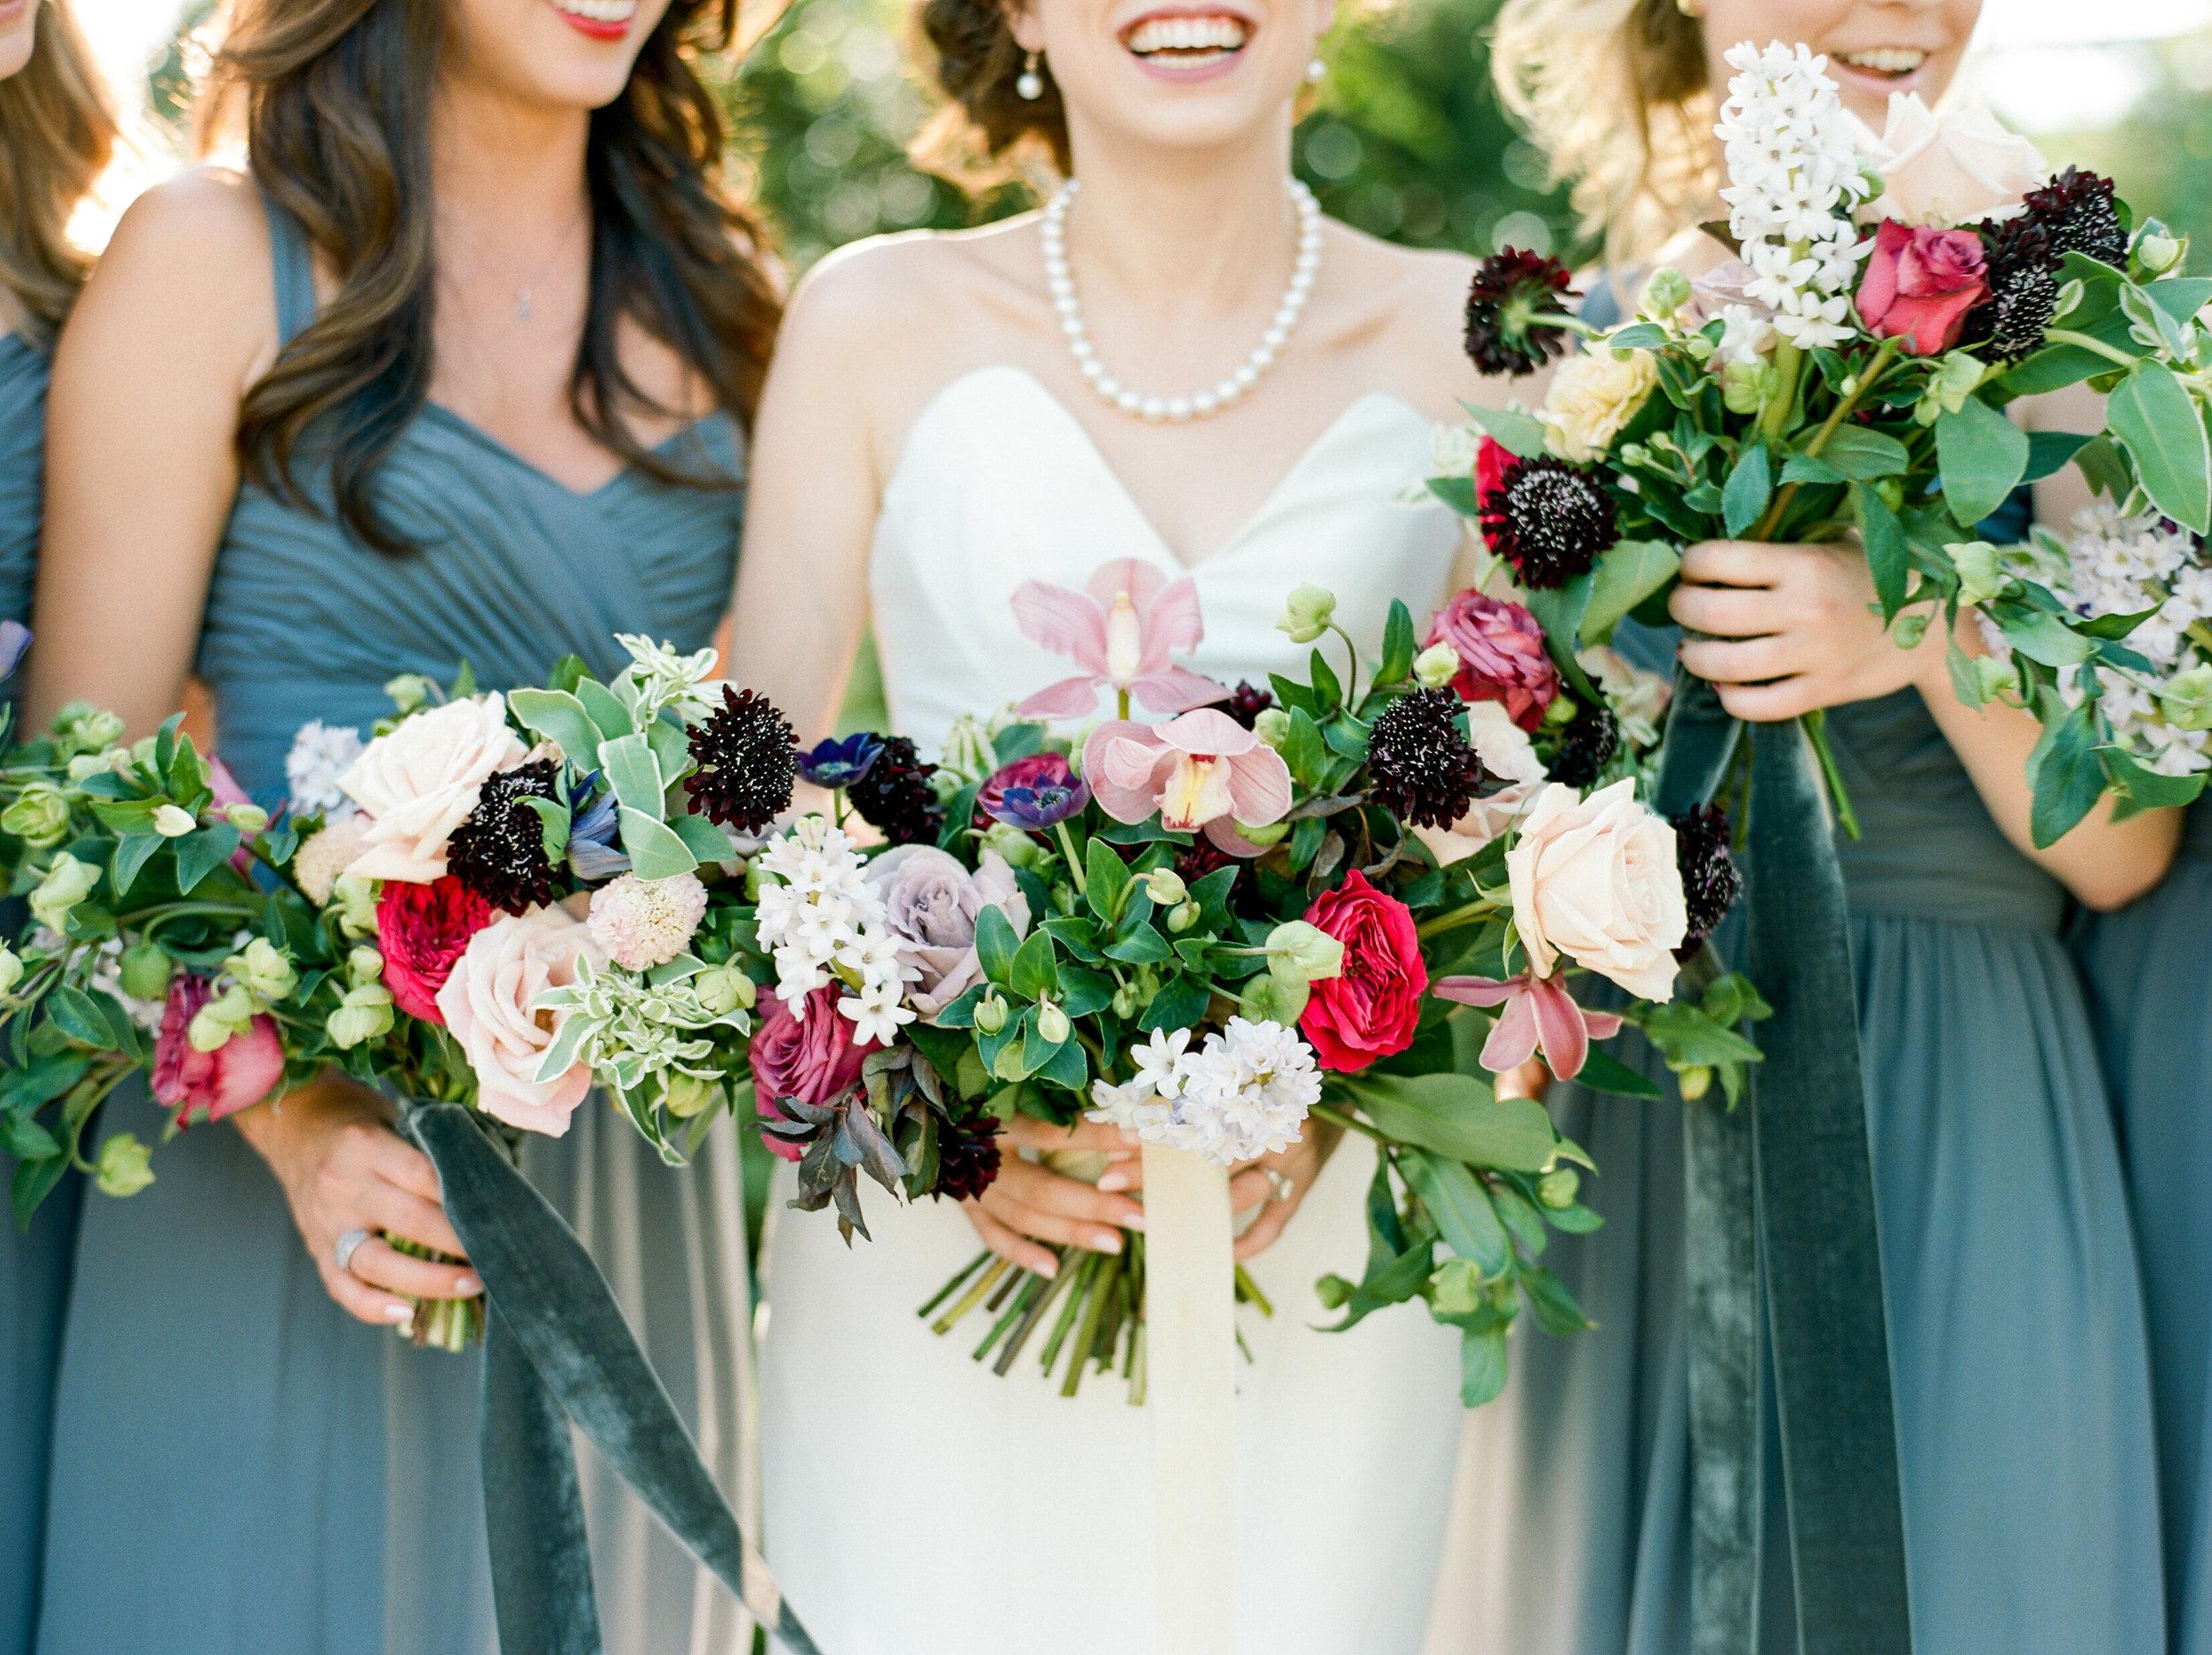 The-Knot-Texas-Magazine-Wedding-Top-Best-Houston-Wedding-Photographer-Fine-Art-Film-Dana-Fernandez-Photography-112.jpg